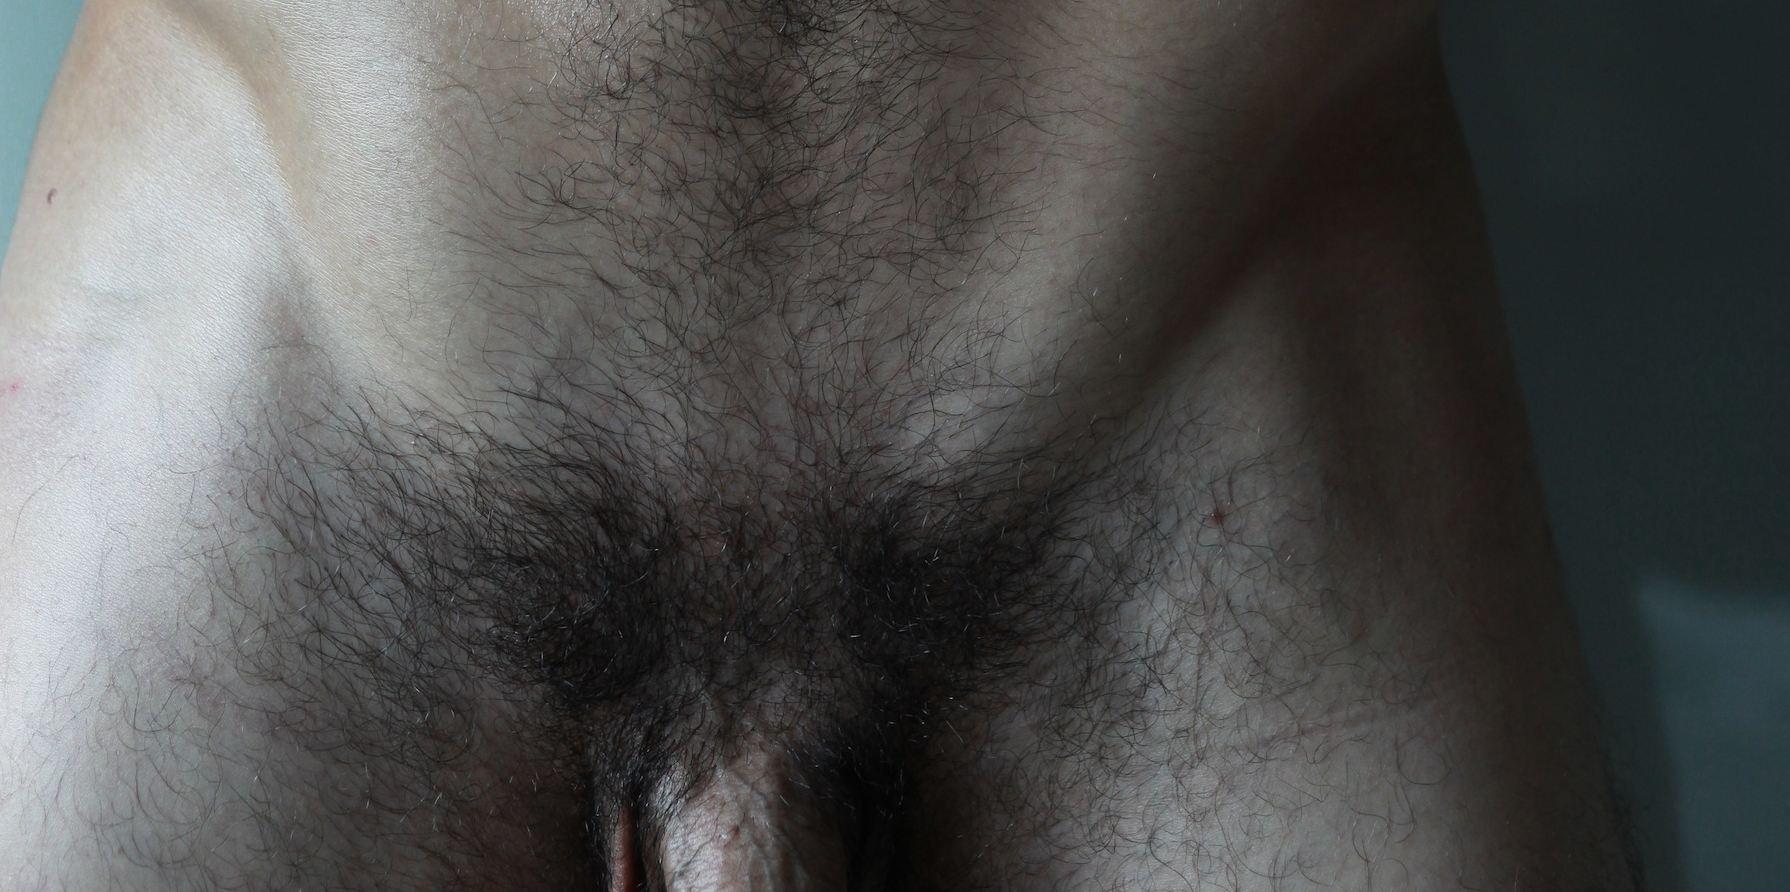 benj-godfre-torso-13.JPG